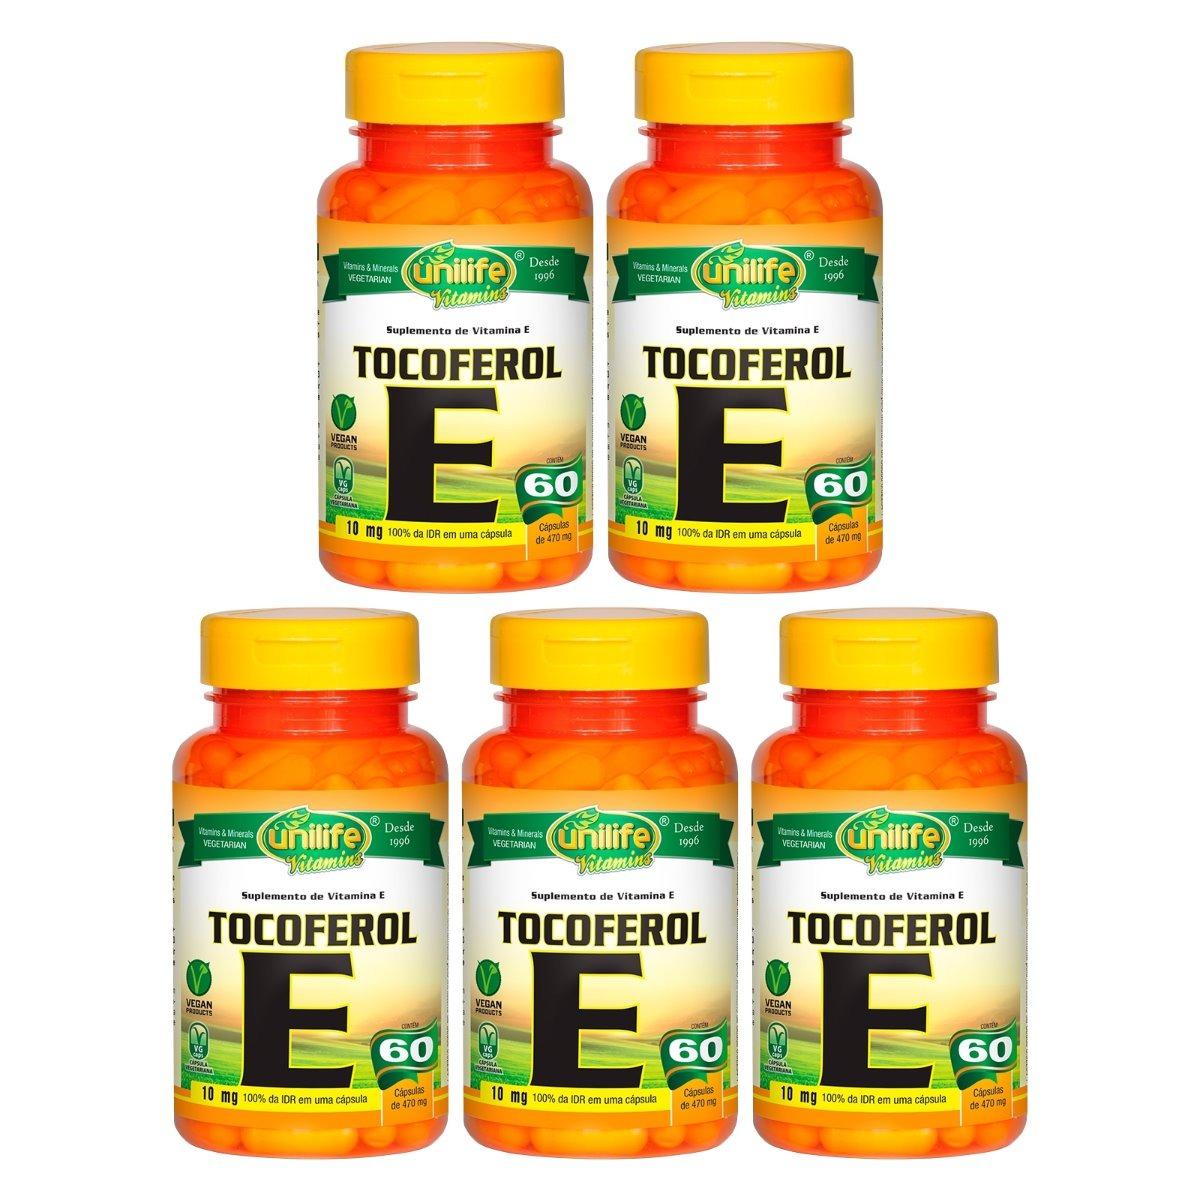 Vitamina E Tocoferol 10mg 60 Cápsulas 470mg Unilife Kit 5 Unidades